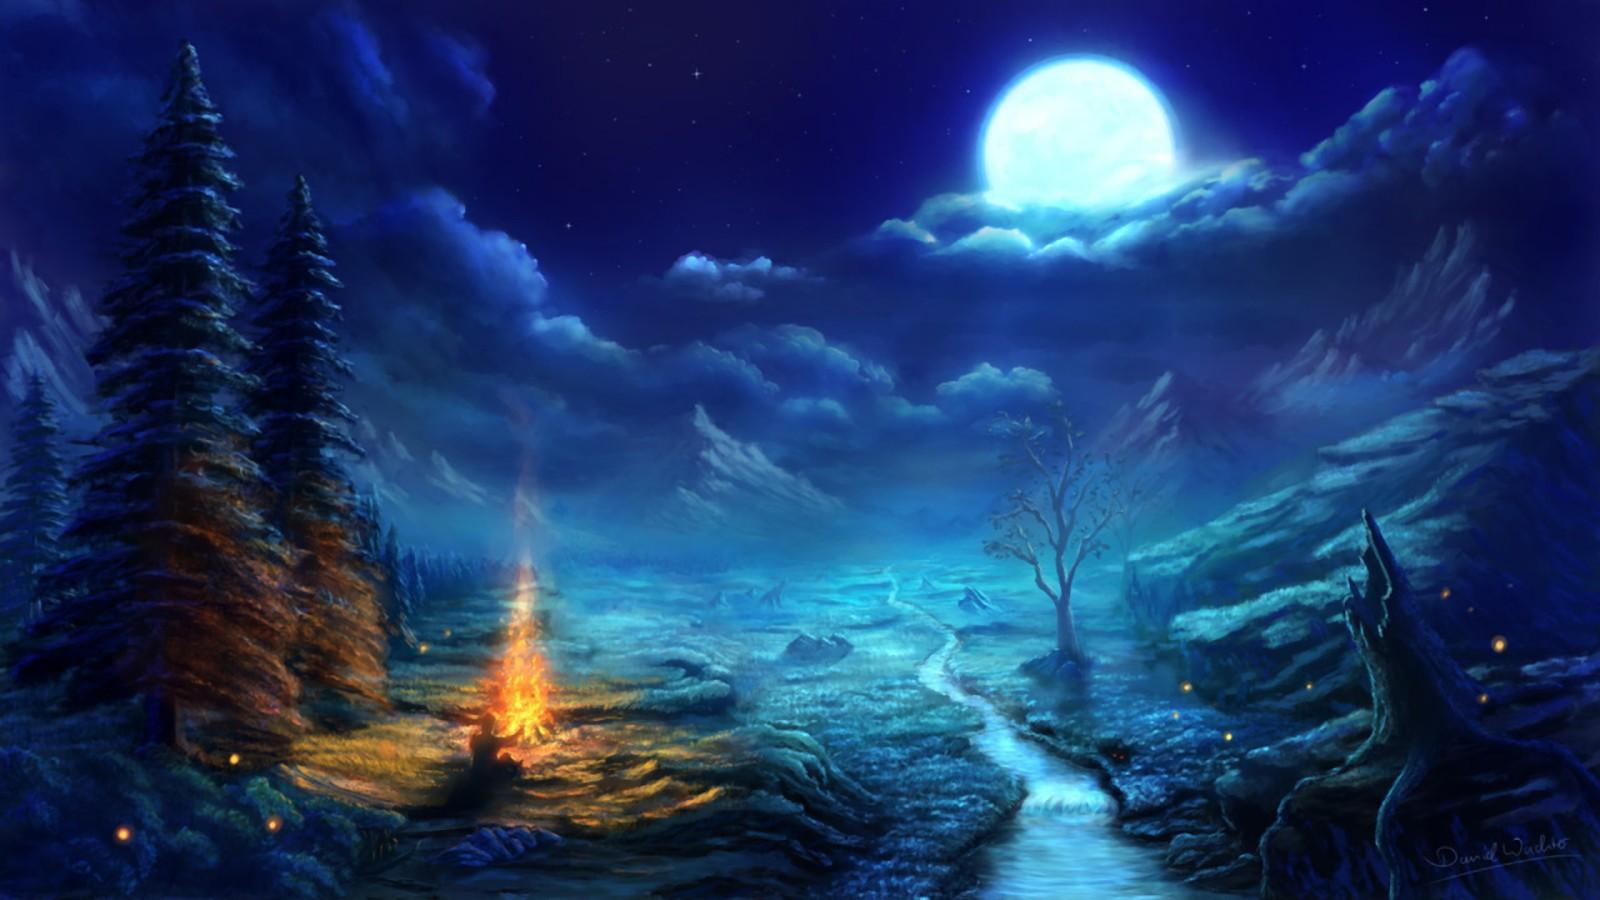 Great Wallpaper Night Art - digital_art_fantasy_art_nature_landscape_night_Moon_fire_trees-53039  HD.jpg!d